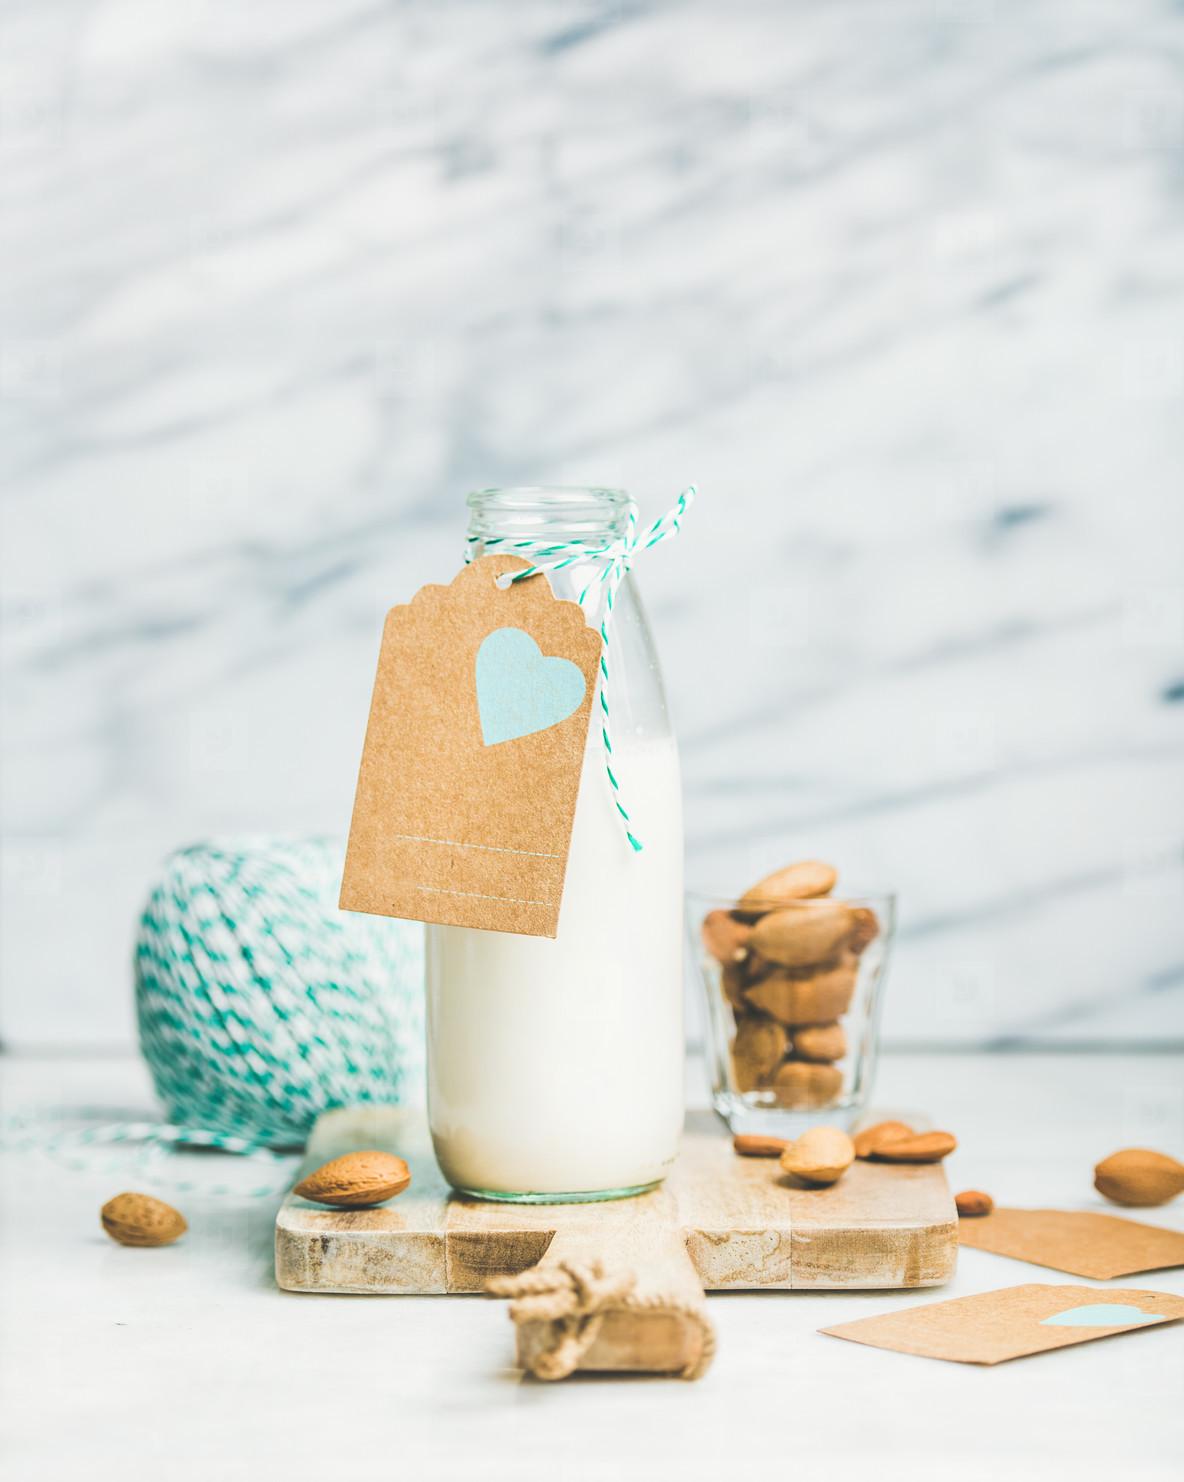 Fresh vegetarian dairy free almond milk with craft paper label